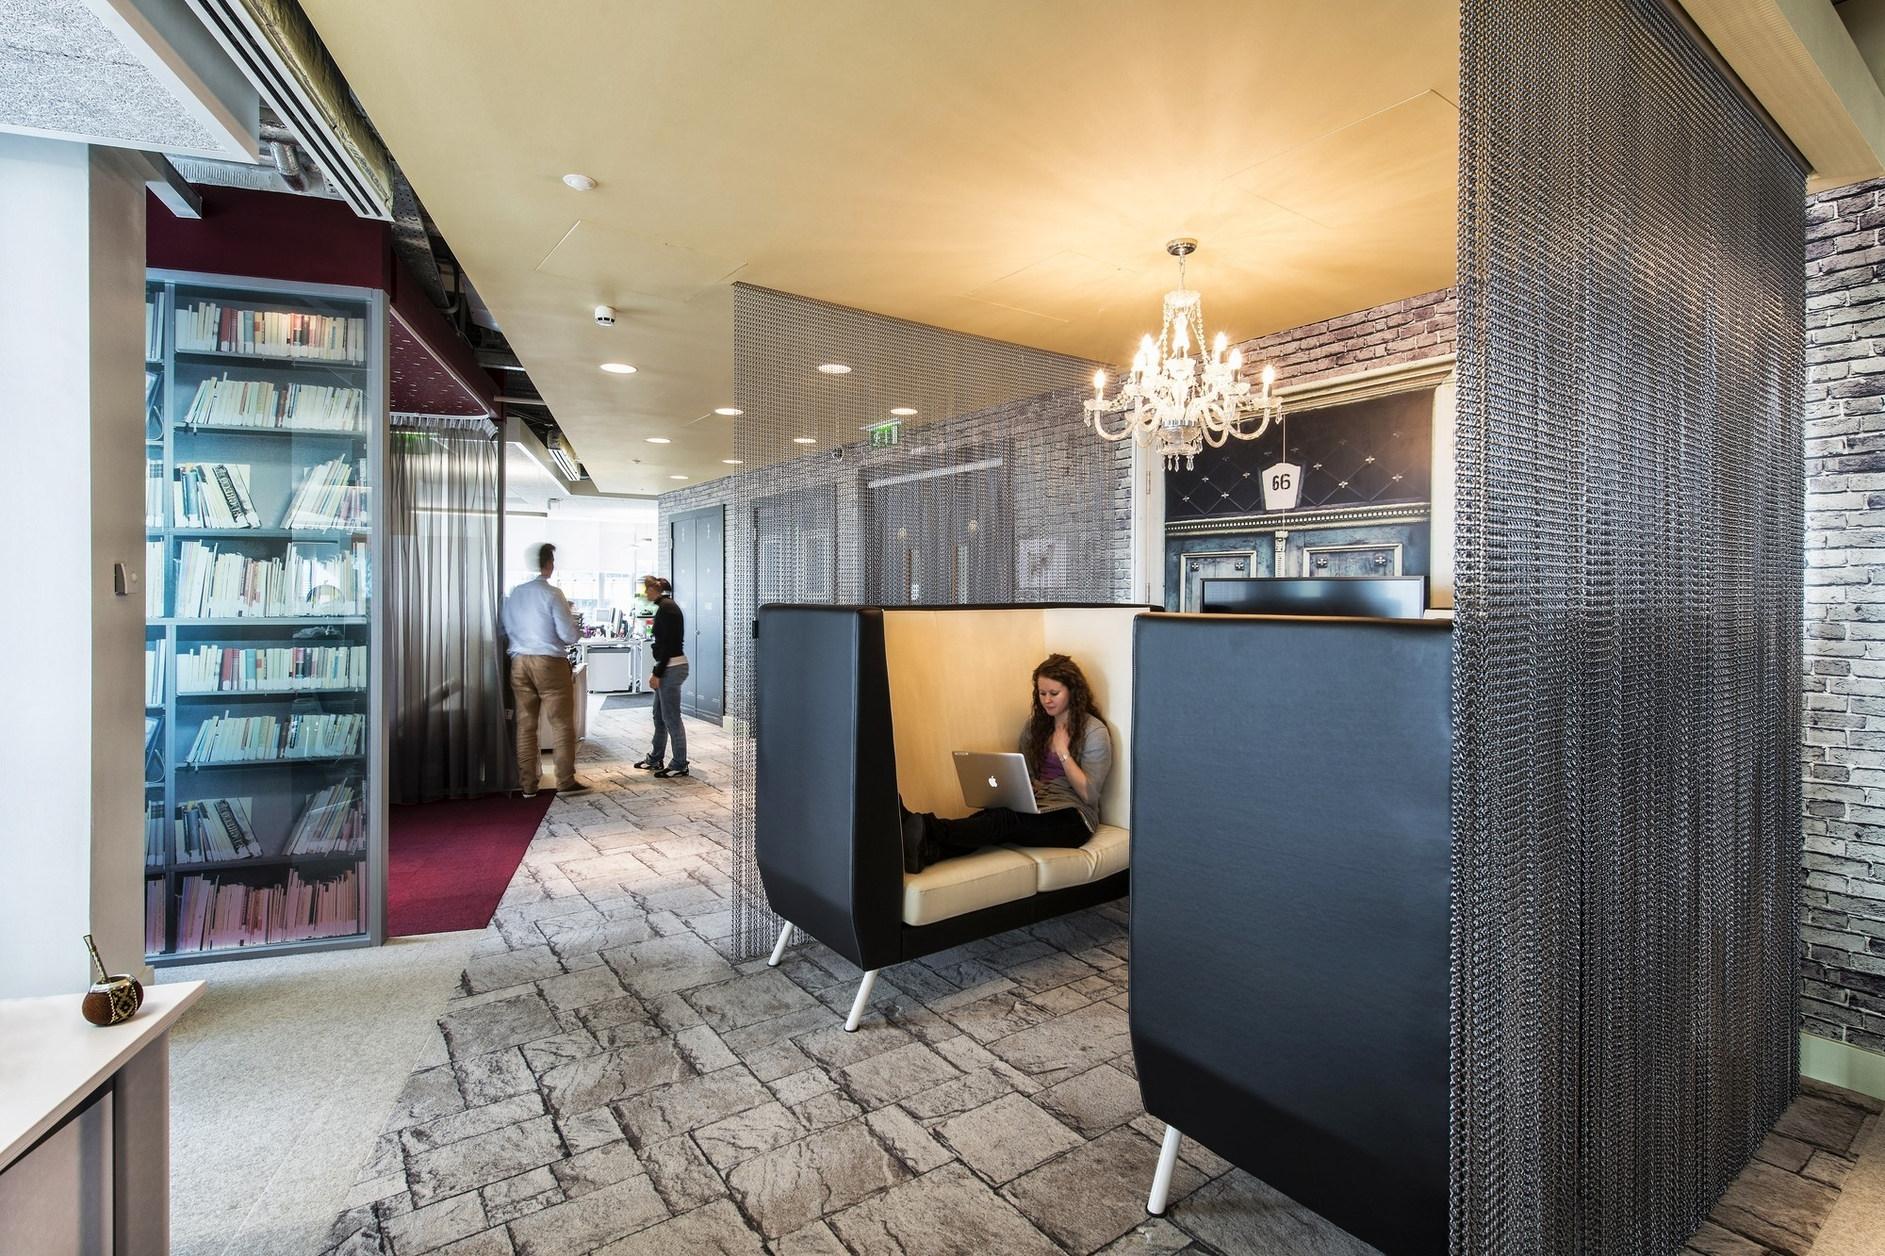 Google campus dublin by camenzind evolution henry j - Office cabin interior design images ...